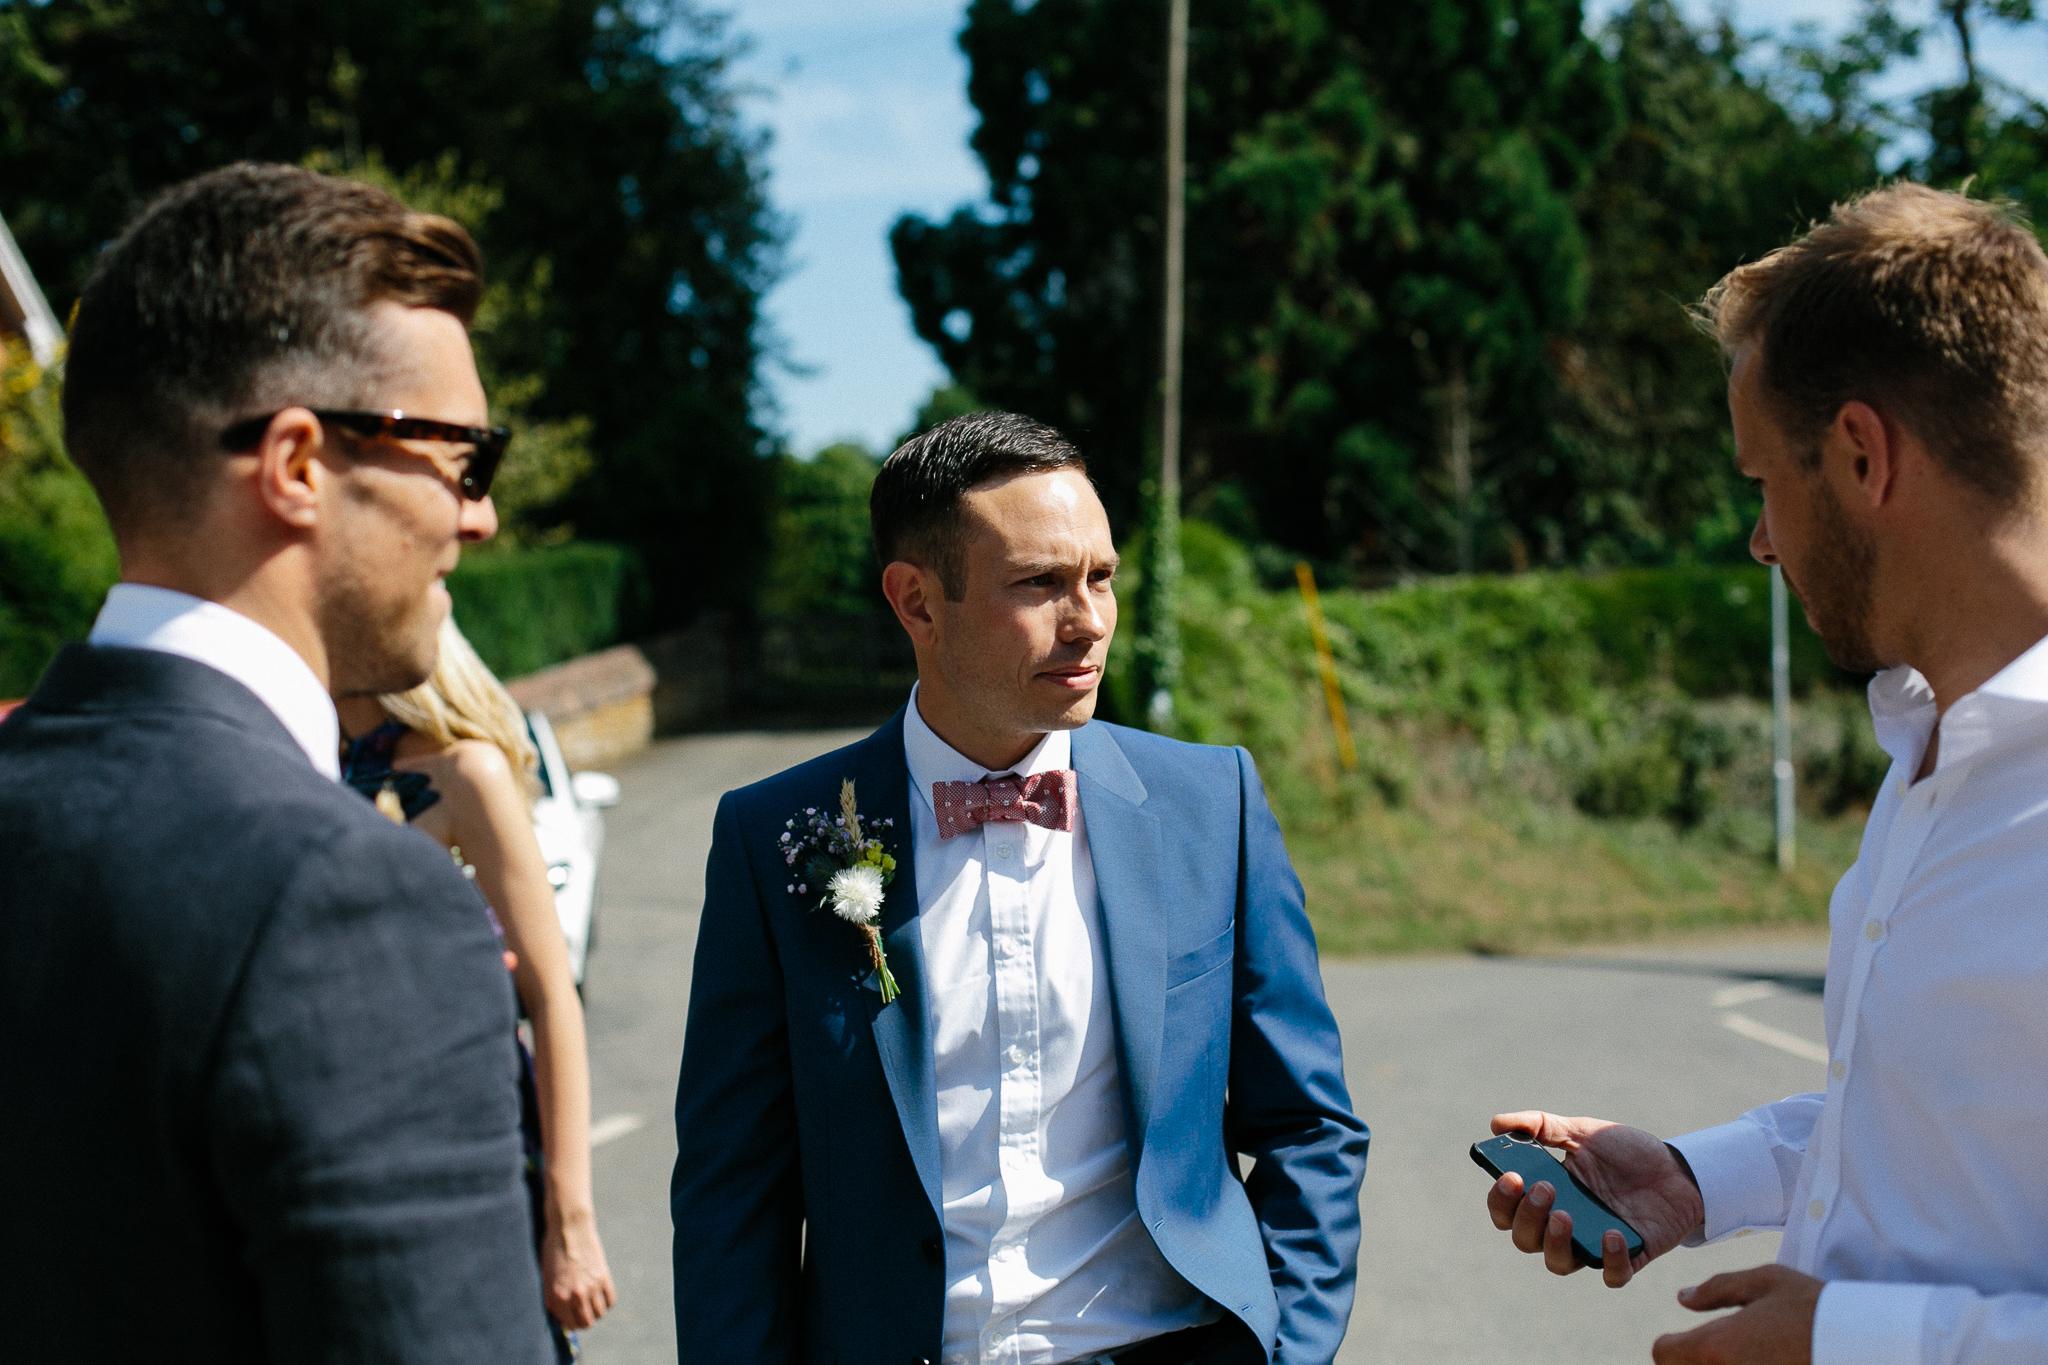 grantham_wedding_photographer-30.jpg